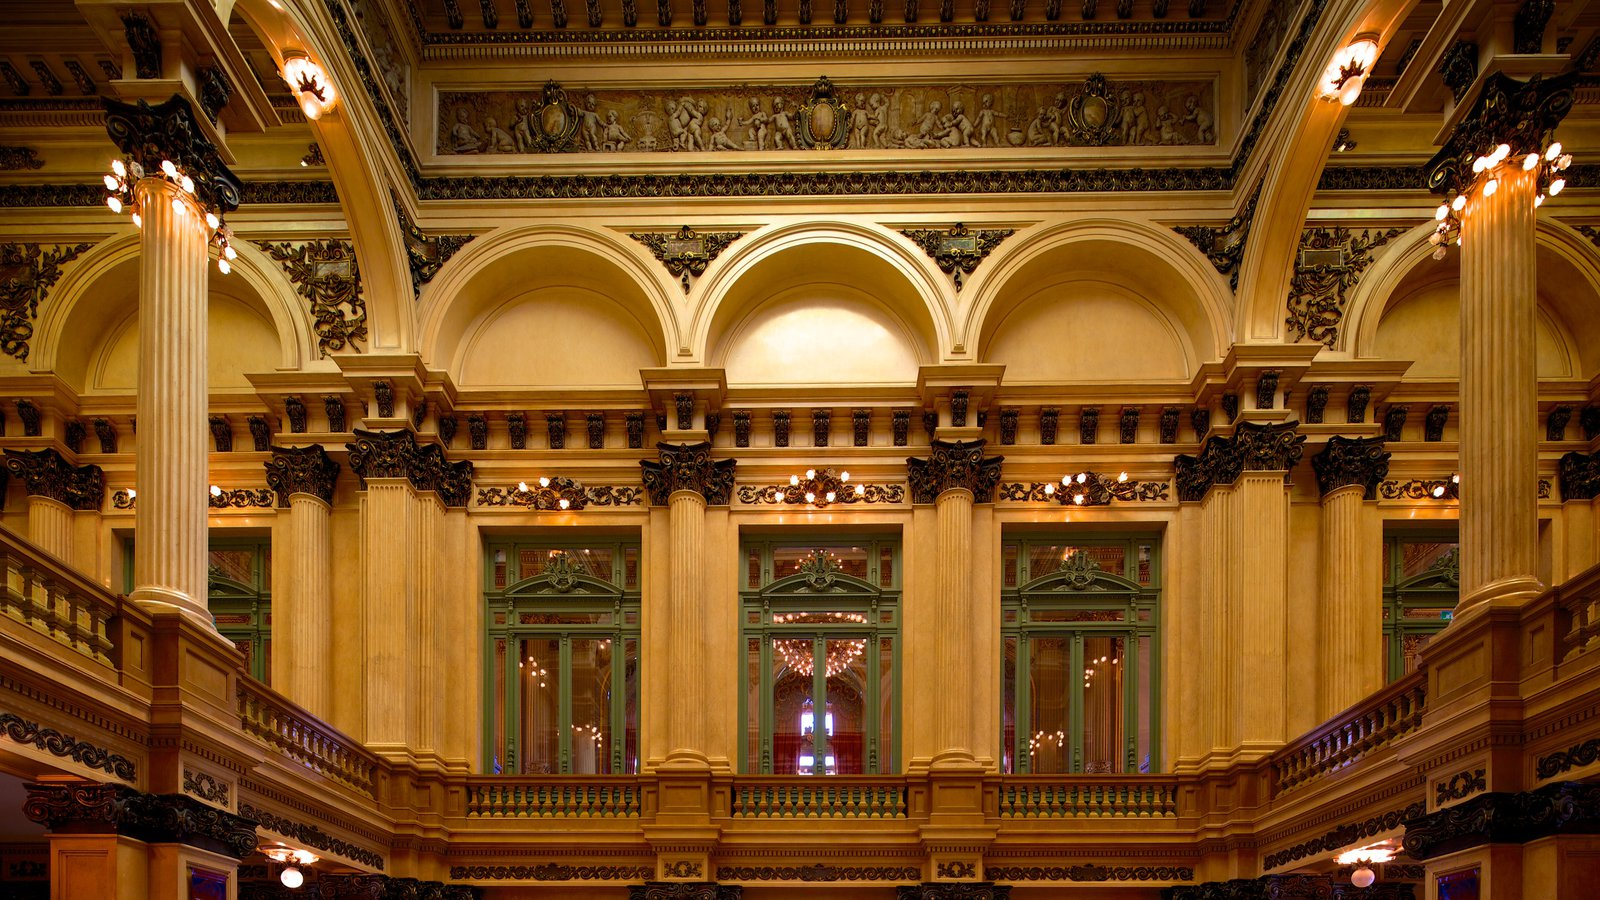 Teatro Colón caracterizando arquitetura de patrimônio, vistas internas e cenas de teatro